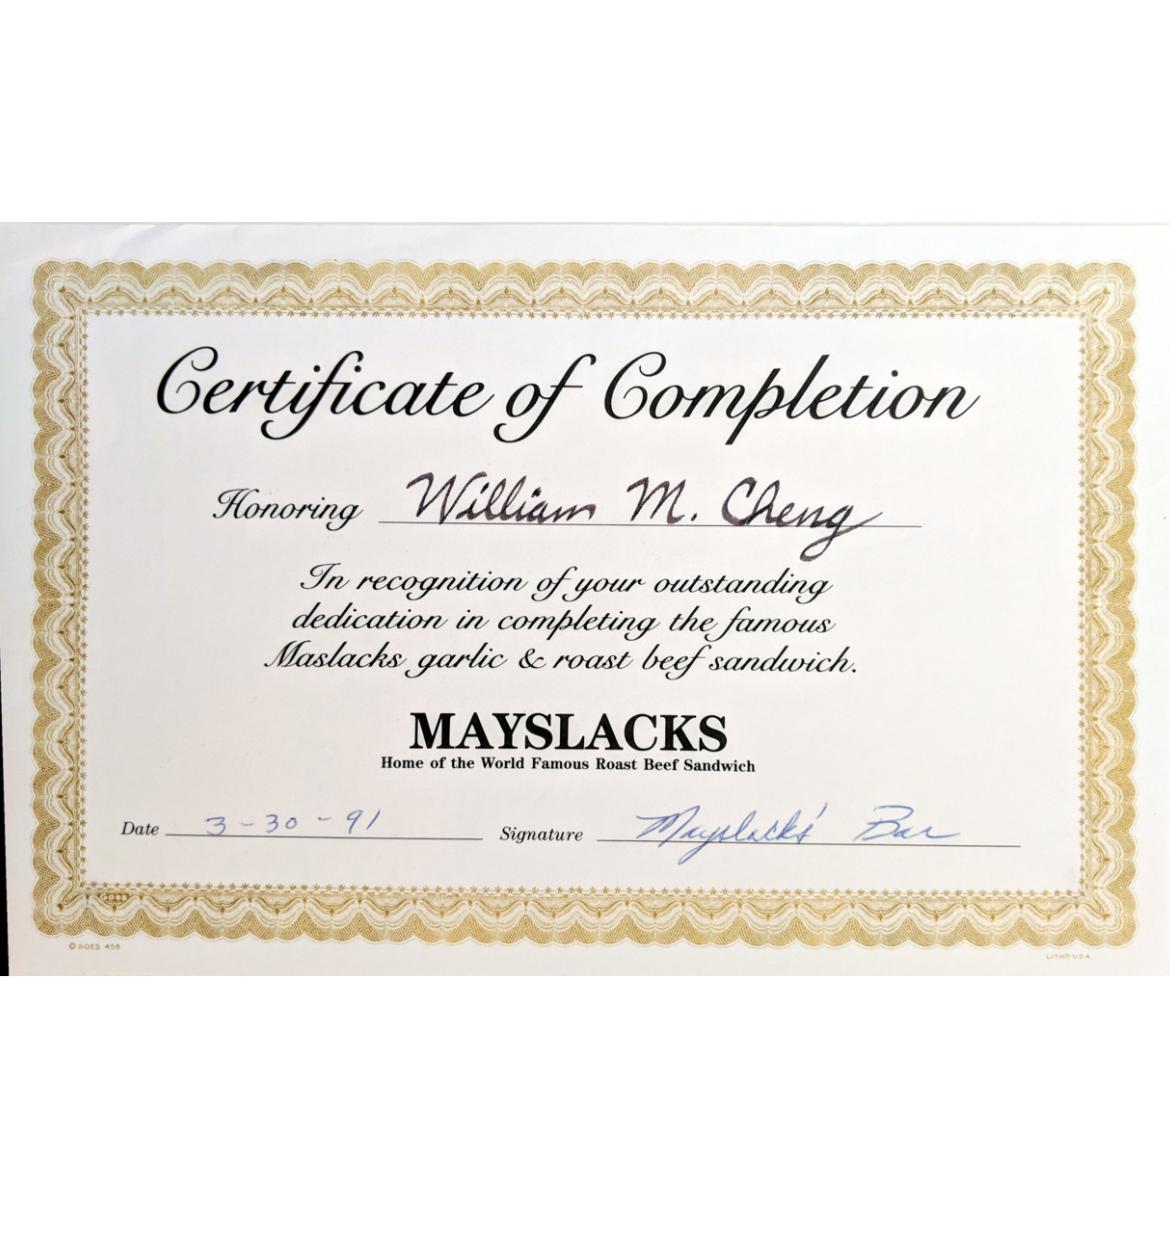 Mayslacks 91